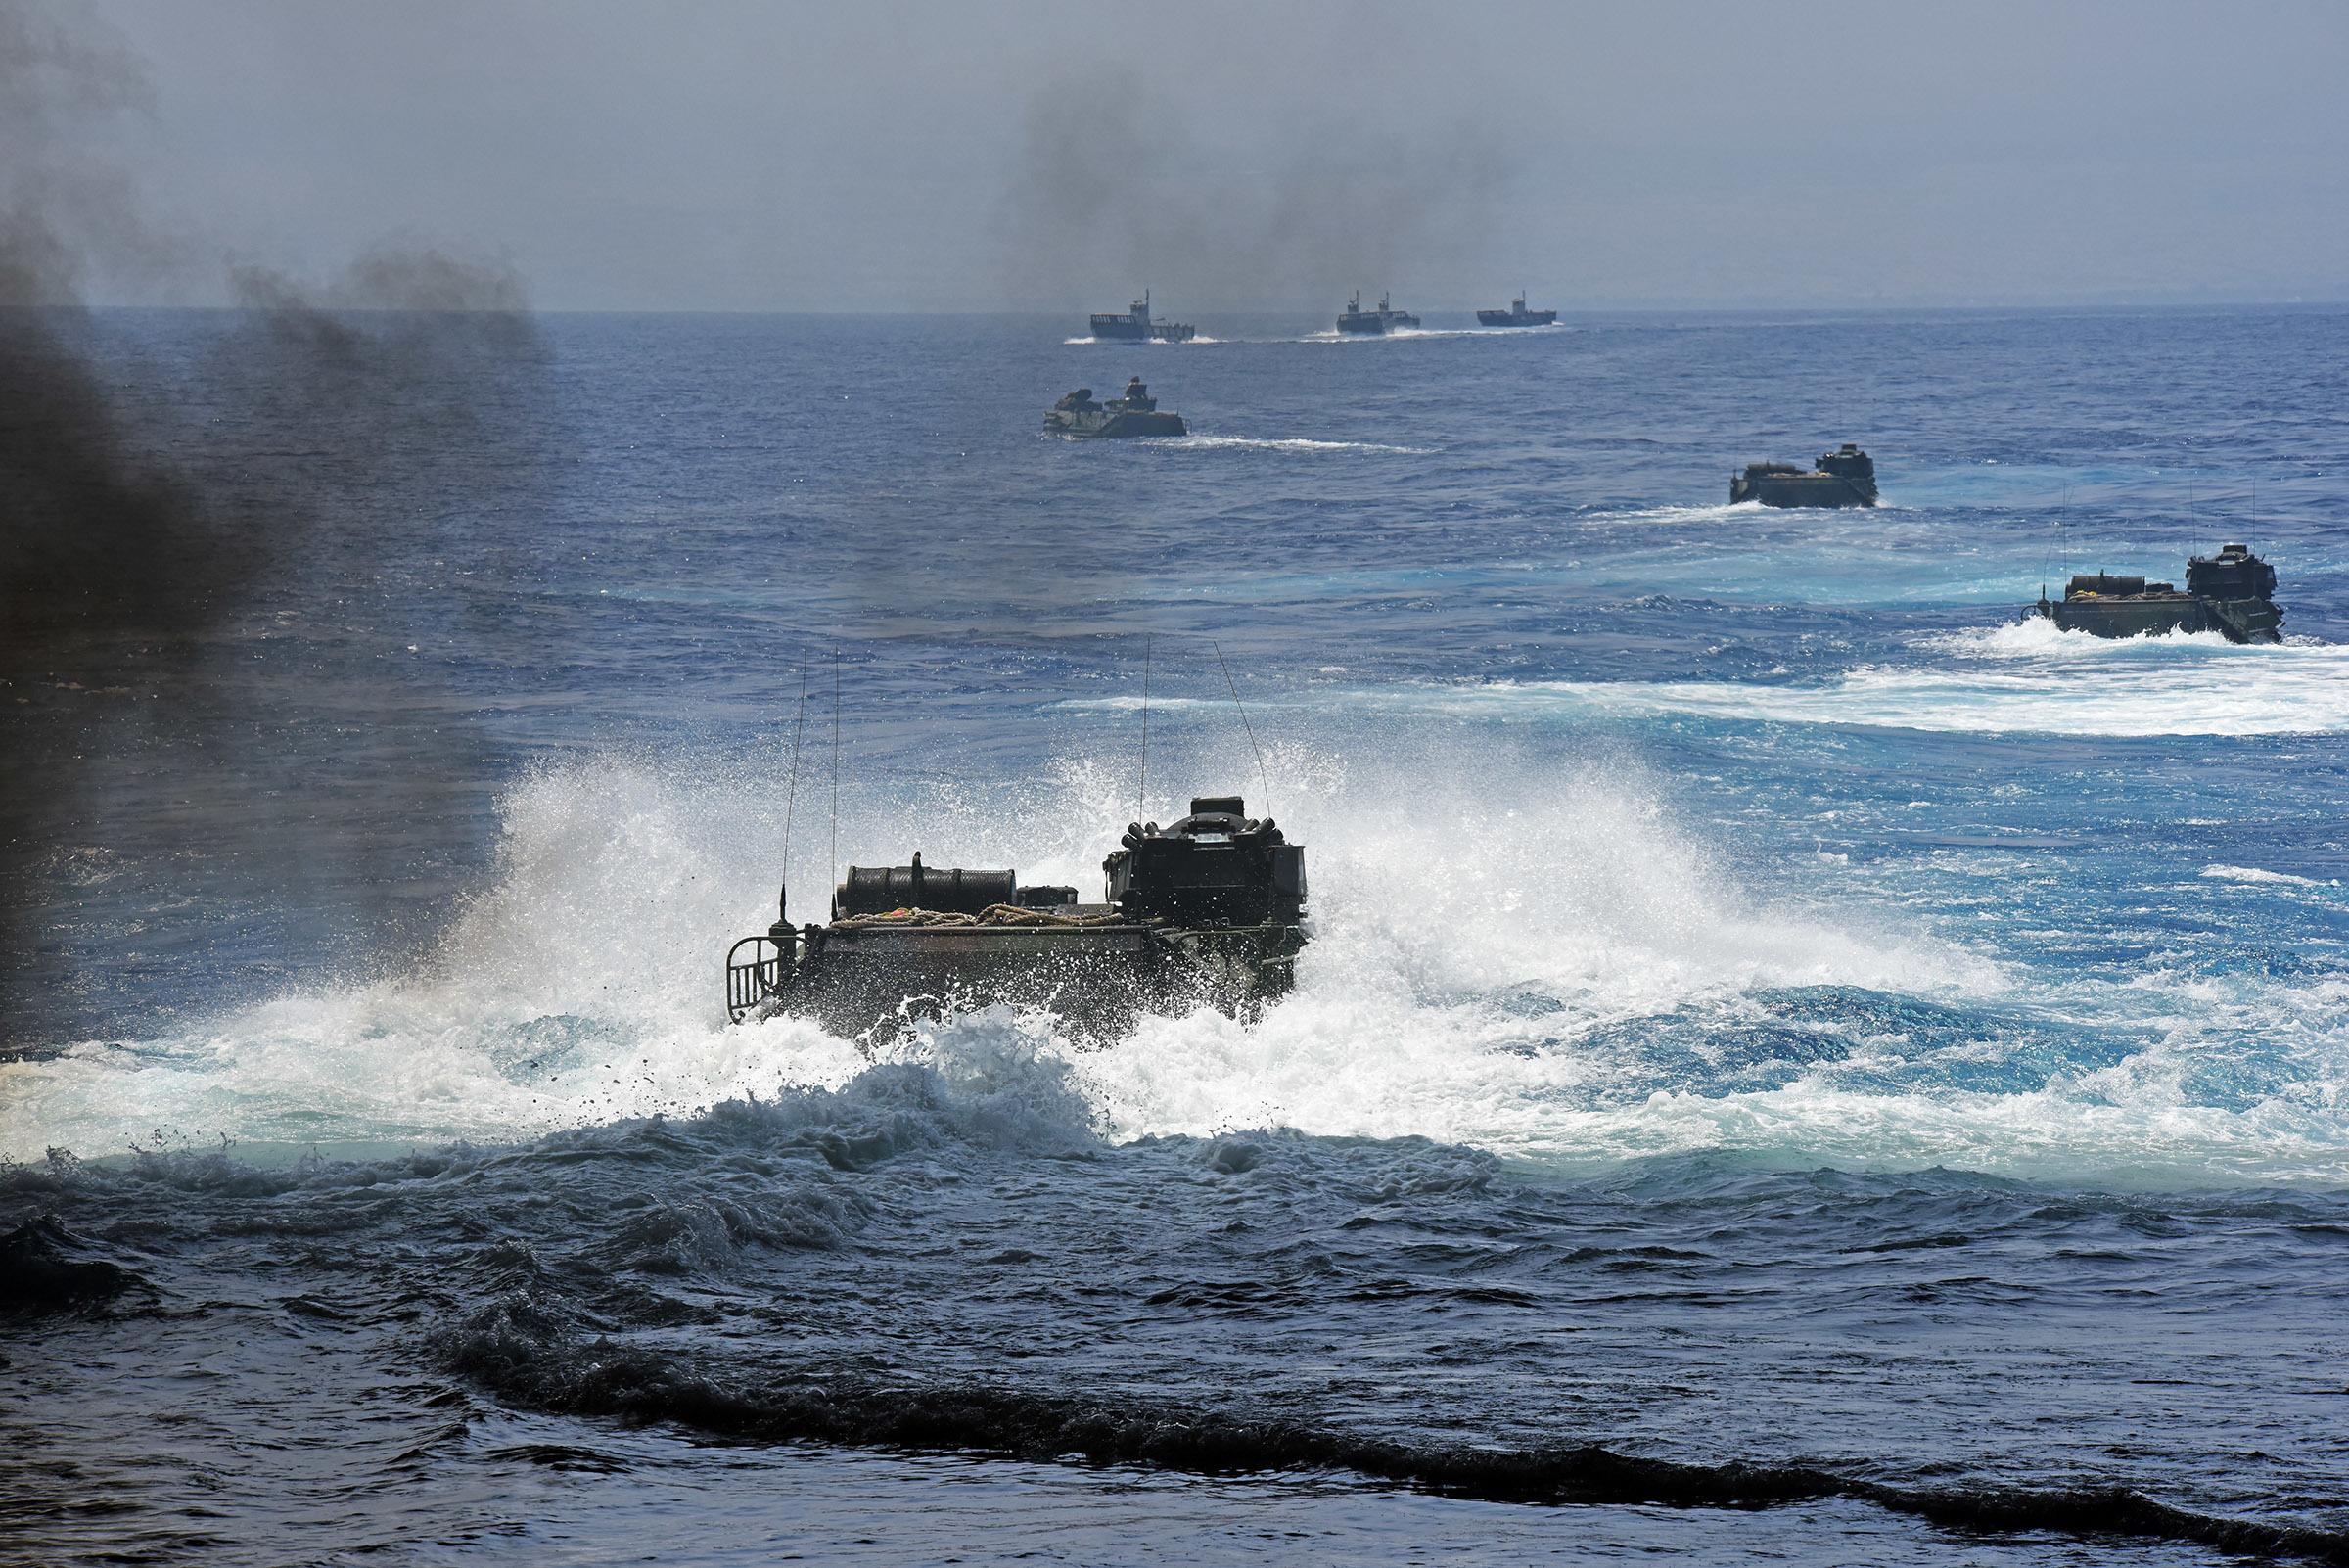 Amphibious assault vehicles depart the well deck of amphibious transport dock ship USS San Diego (LPD 22) while Royal Australian Navy LHD landing craft wait to escort them on July 18, 2016. US Navy photo.